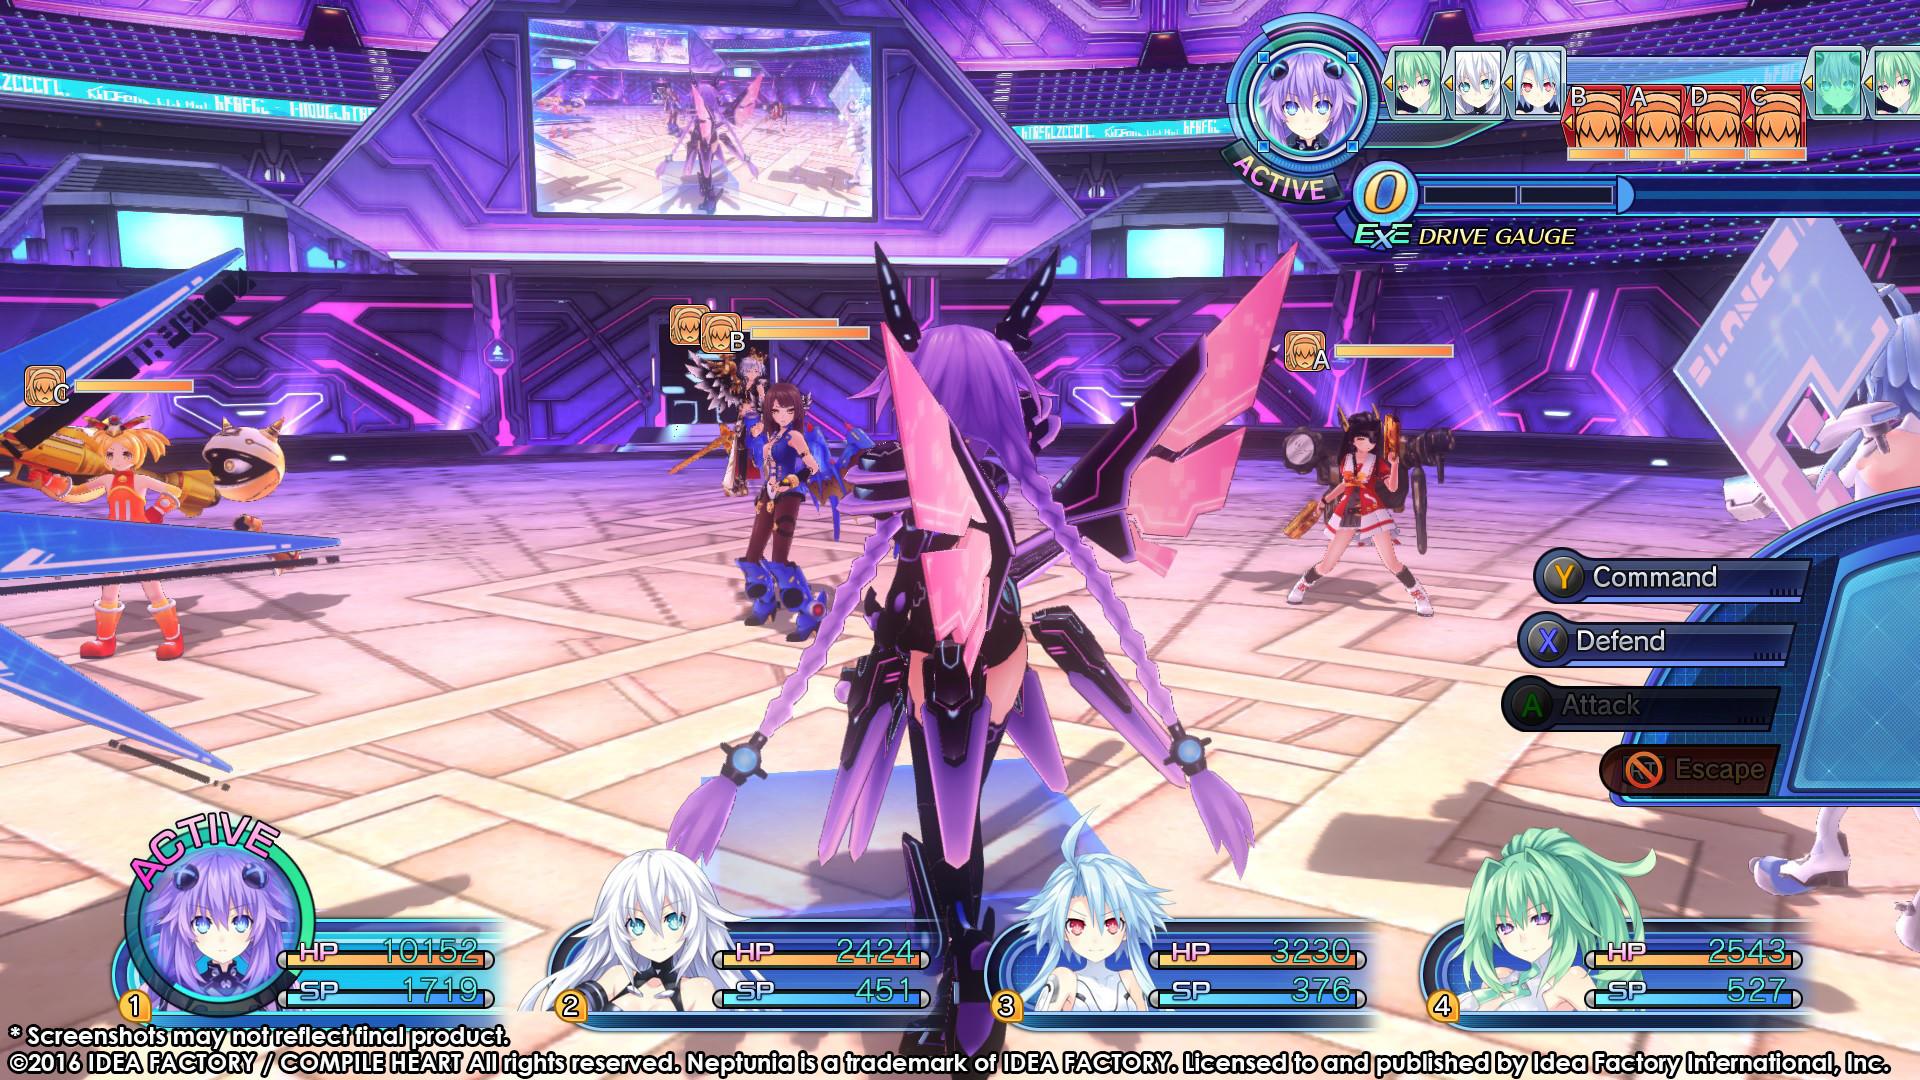 Megadimension Neptunia VII Screenshot 3